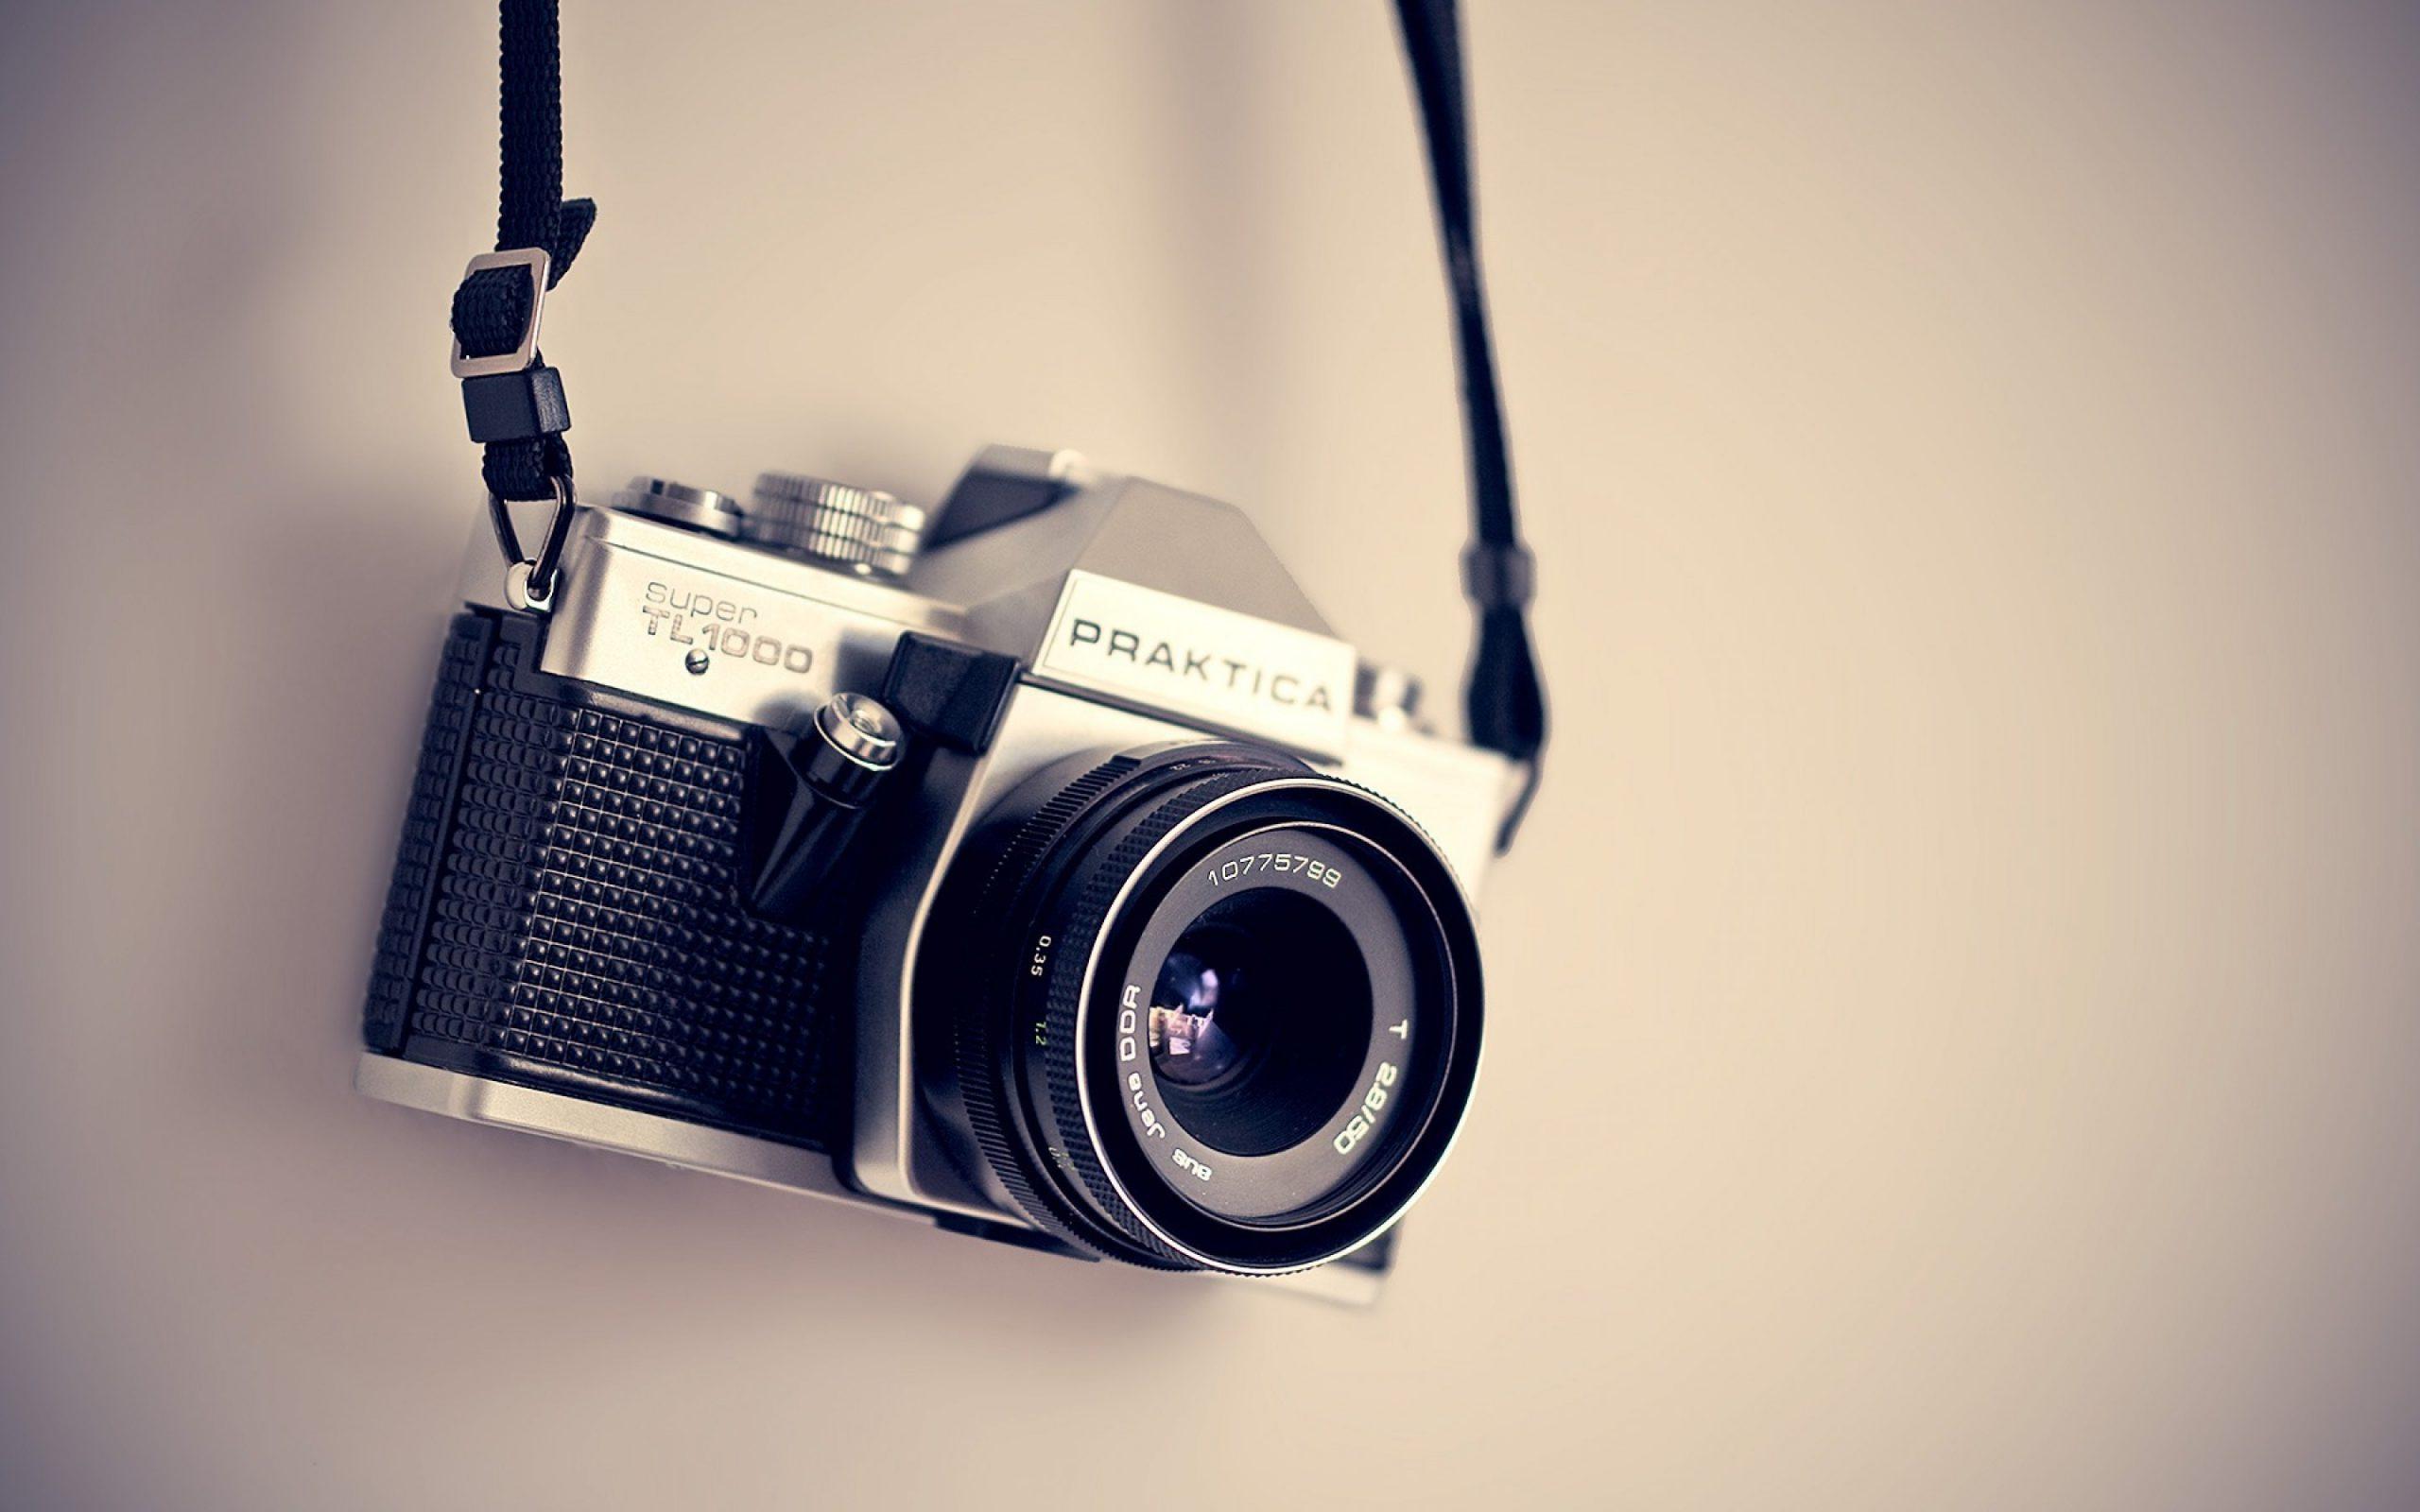 Photo of Super TL1000 Praktica camera